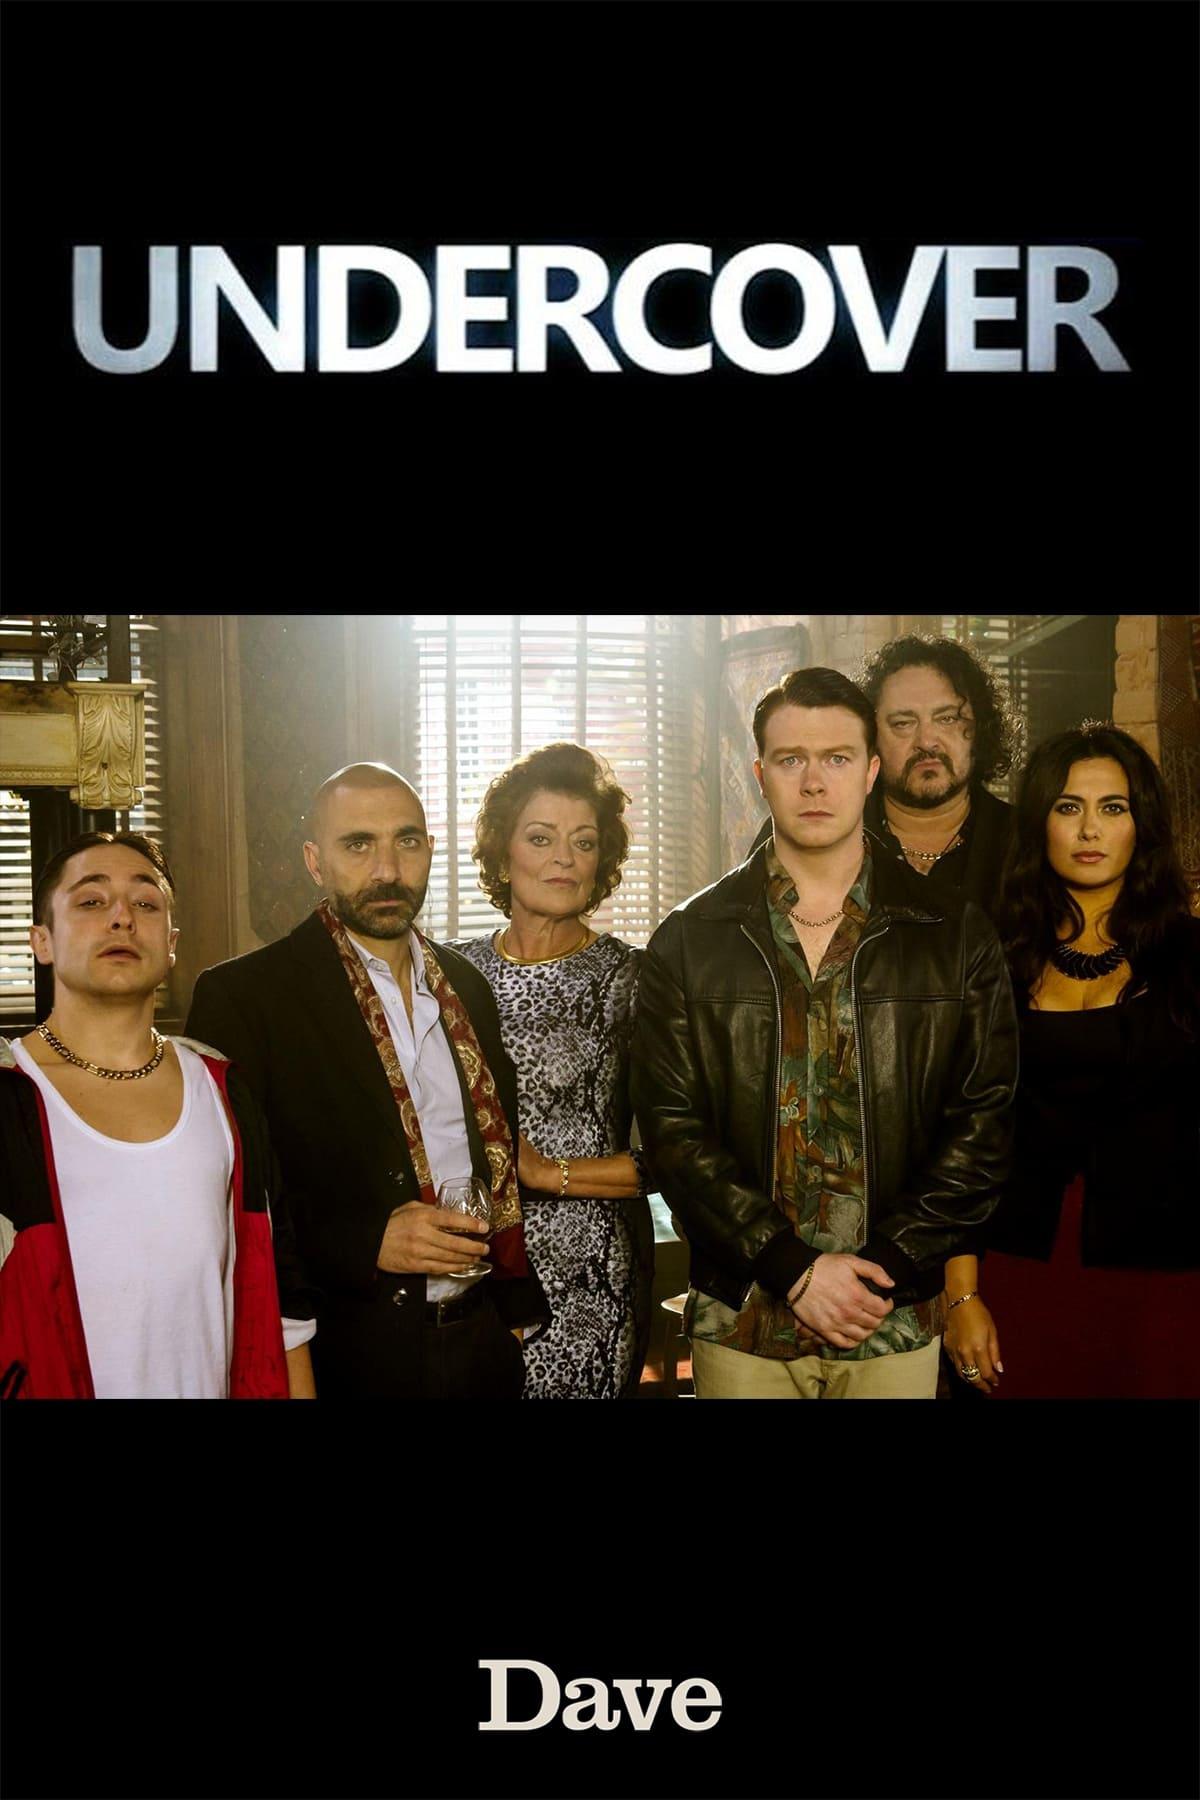 Undercover (2015)